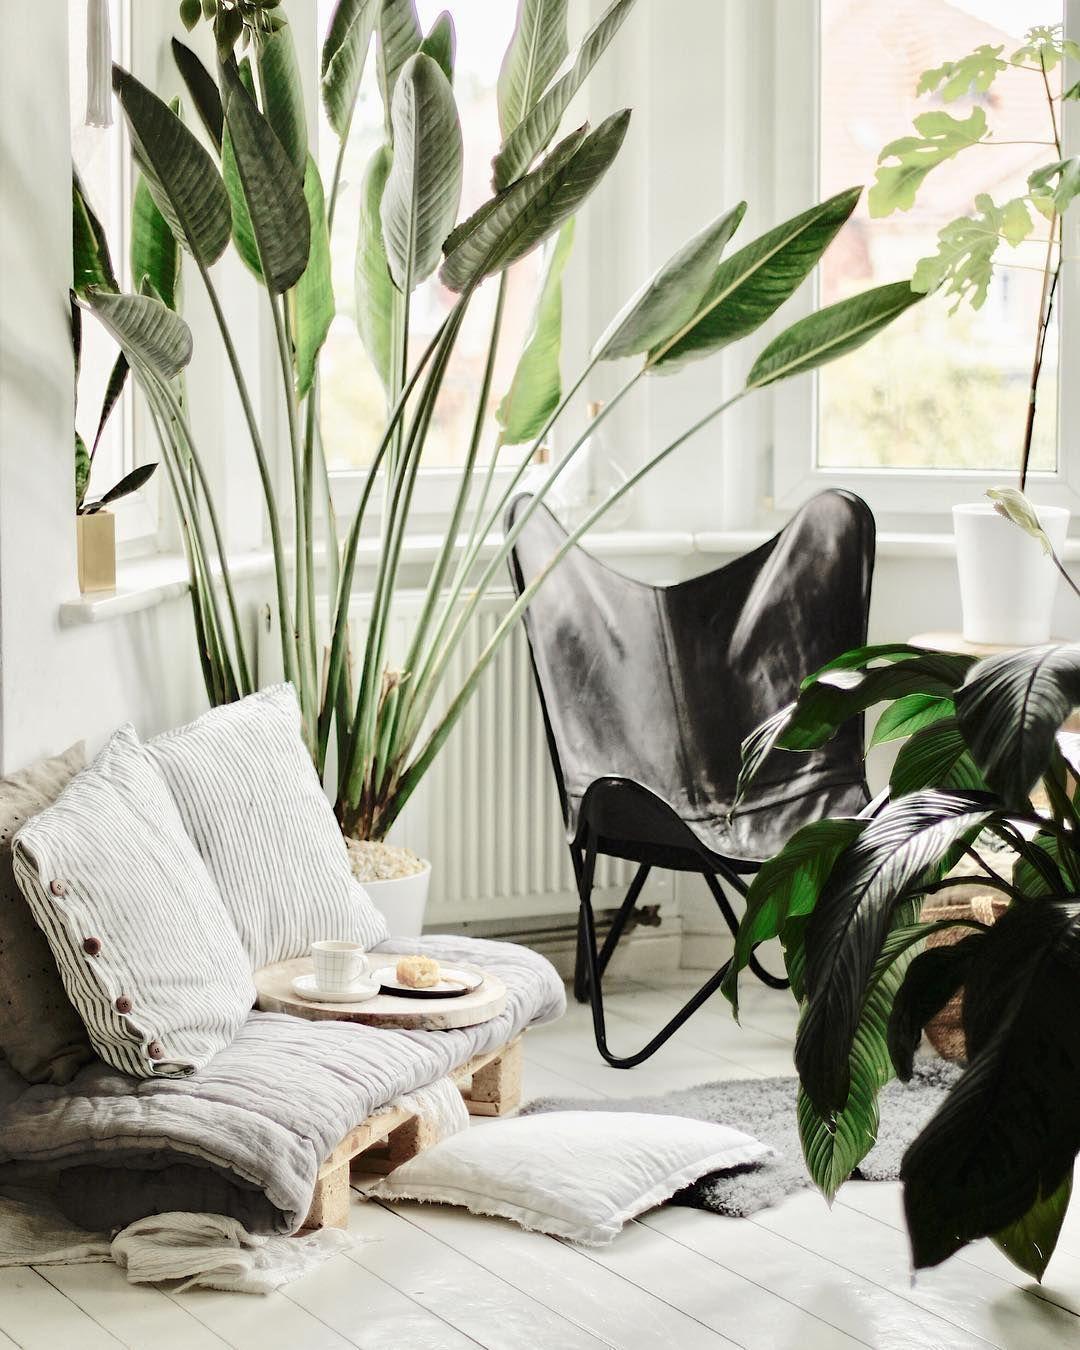 Diytransitionaldecoration interior design plants indoor garden green transitional also diy decoration pinterest rh